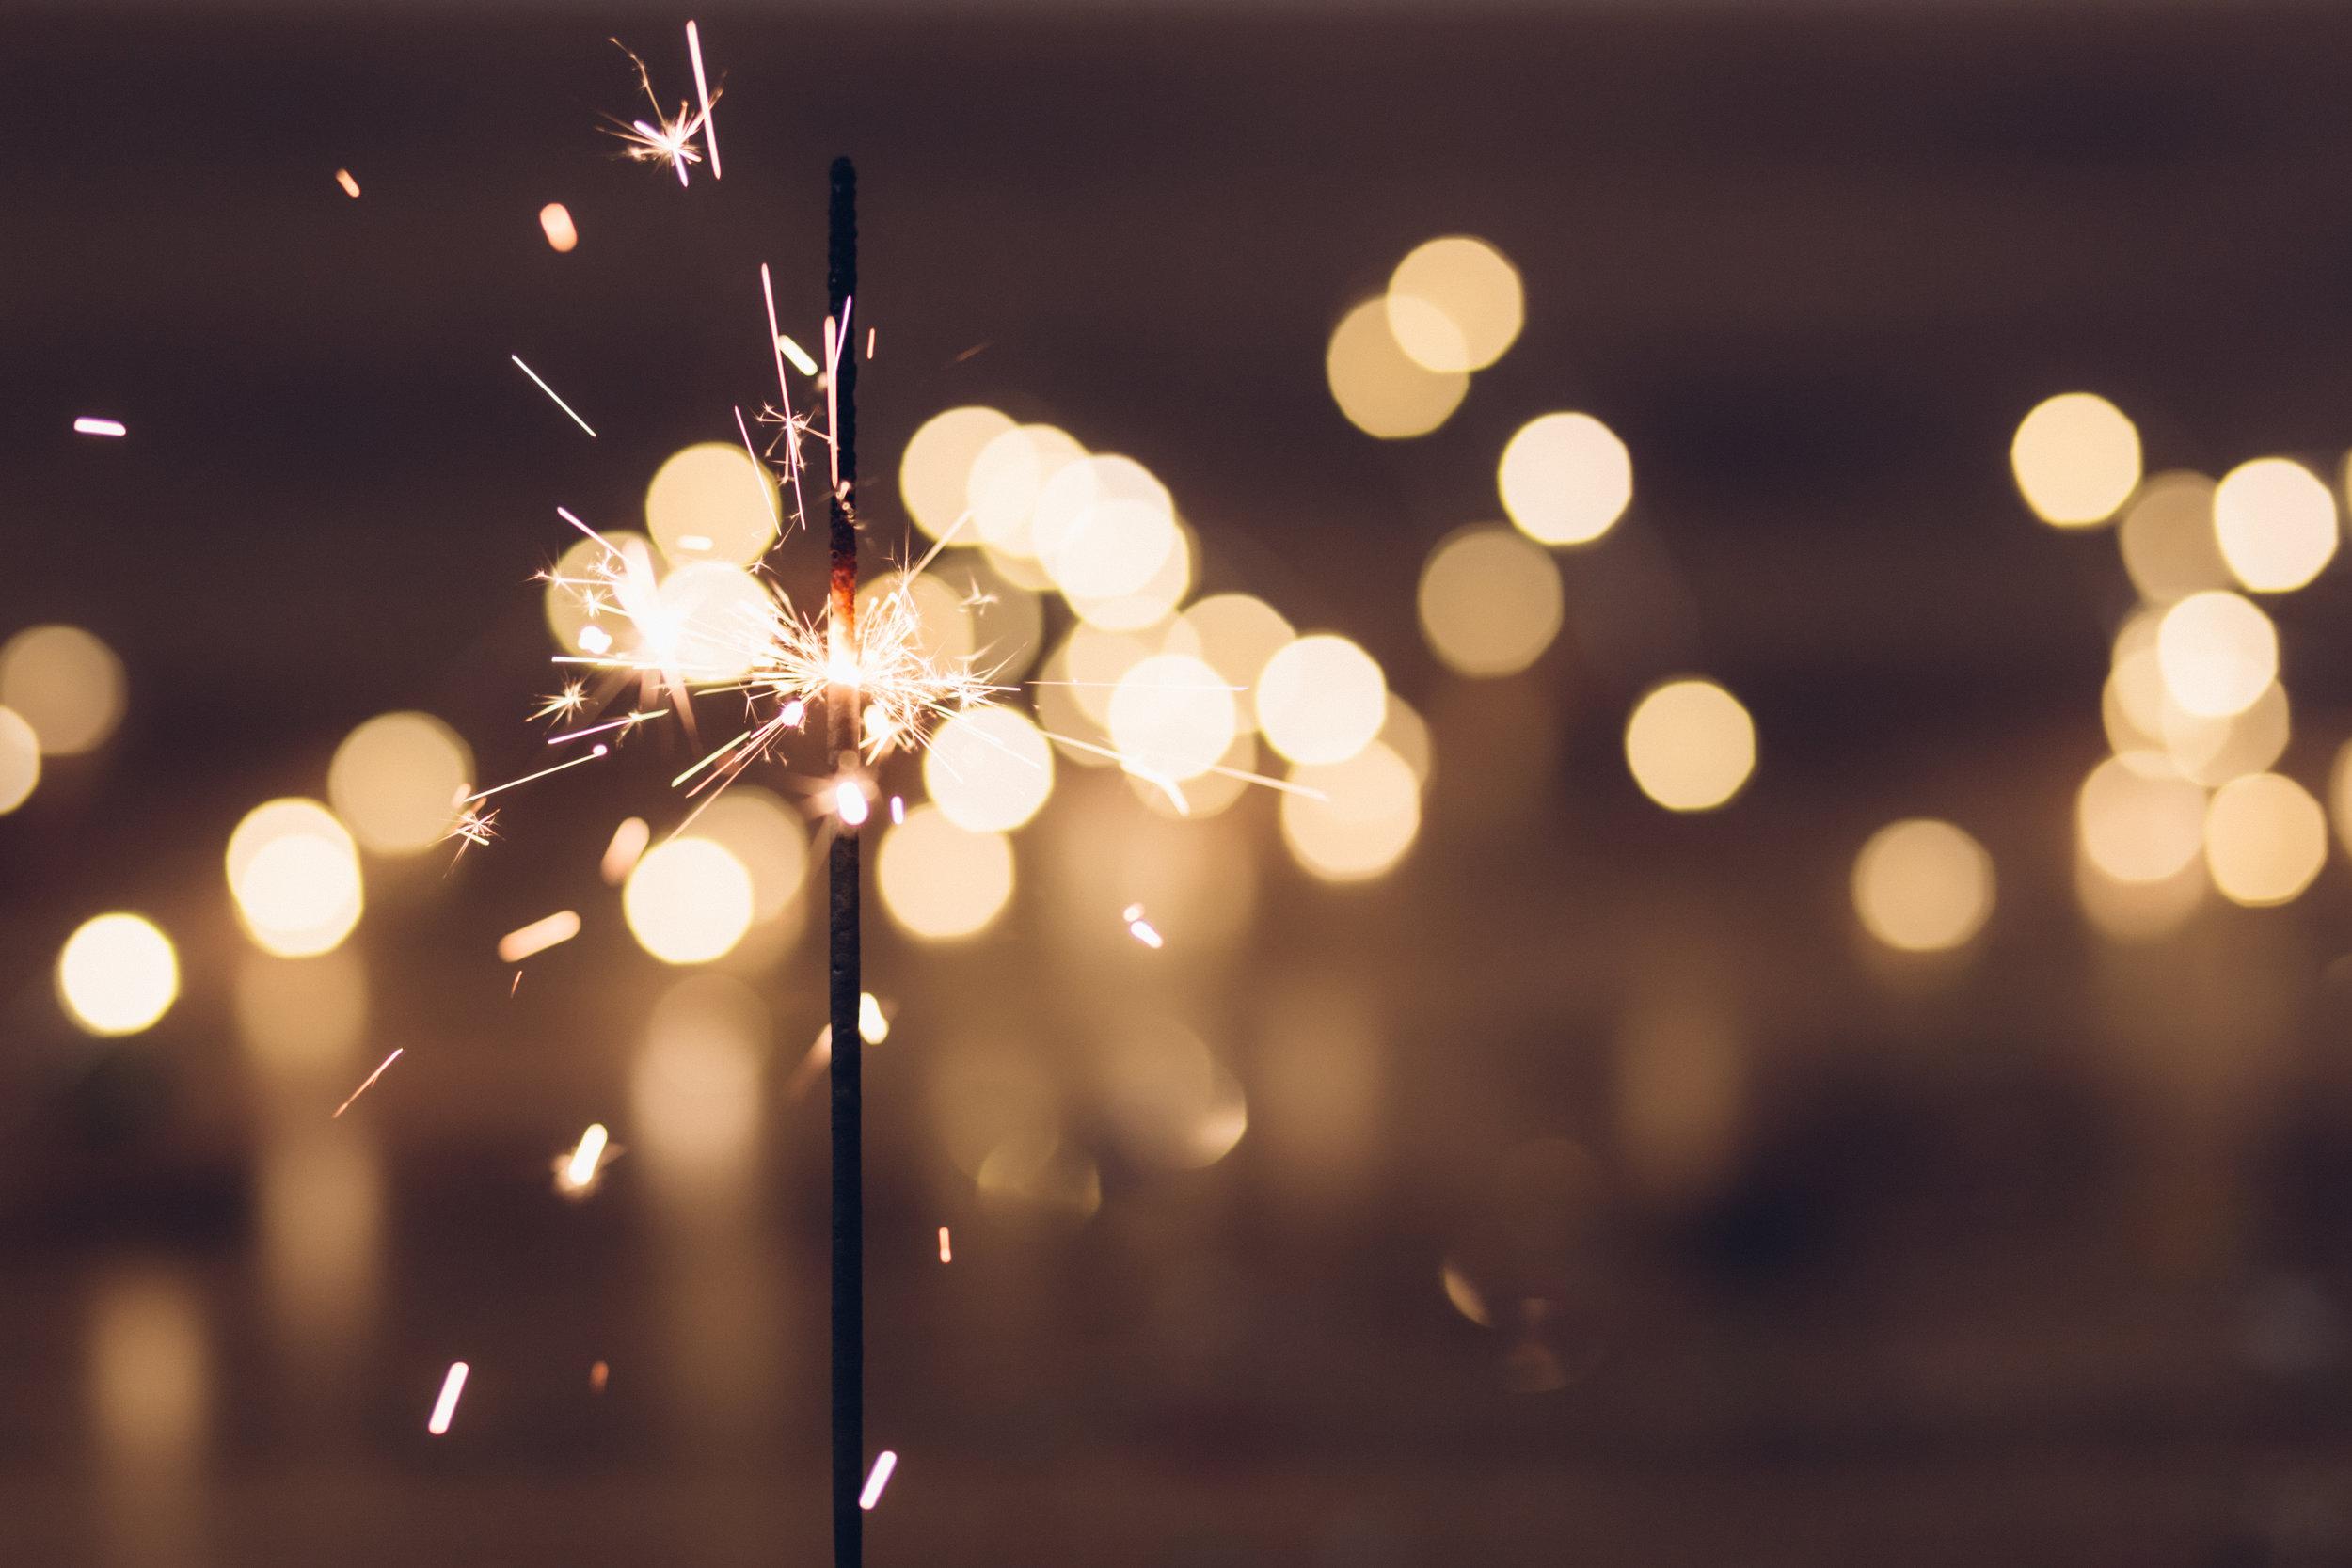 sparkler lighted